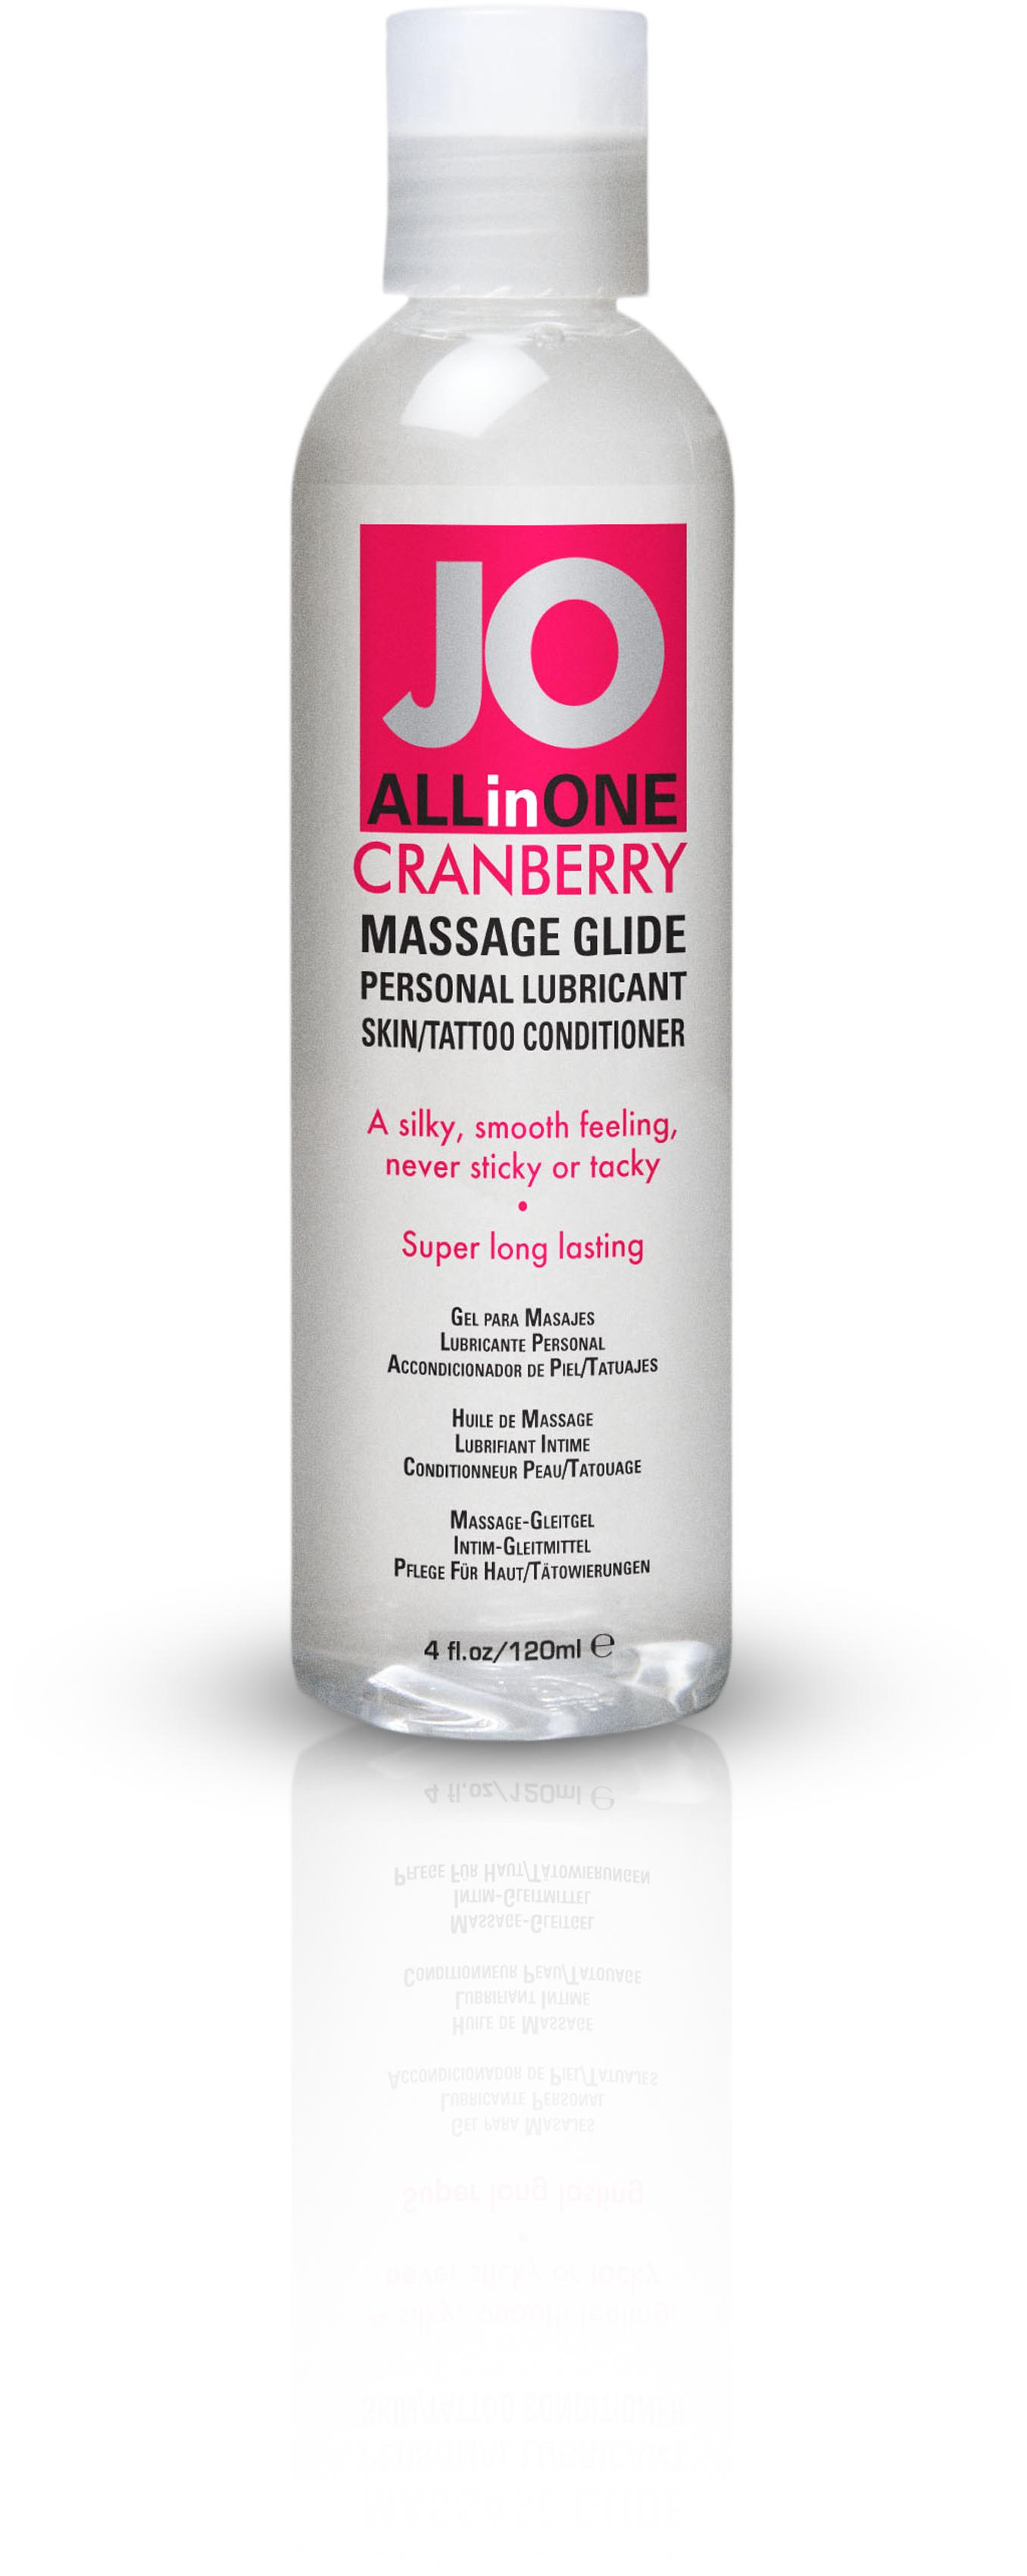 40255_JO_all_in_one_massage_glide_4oz_cranberry.jpg